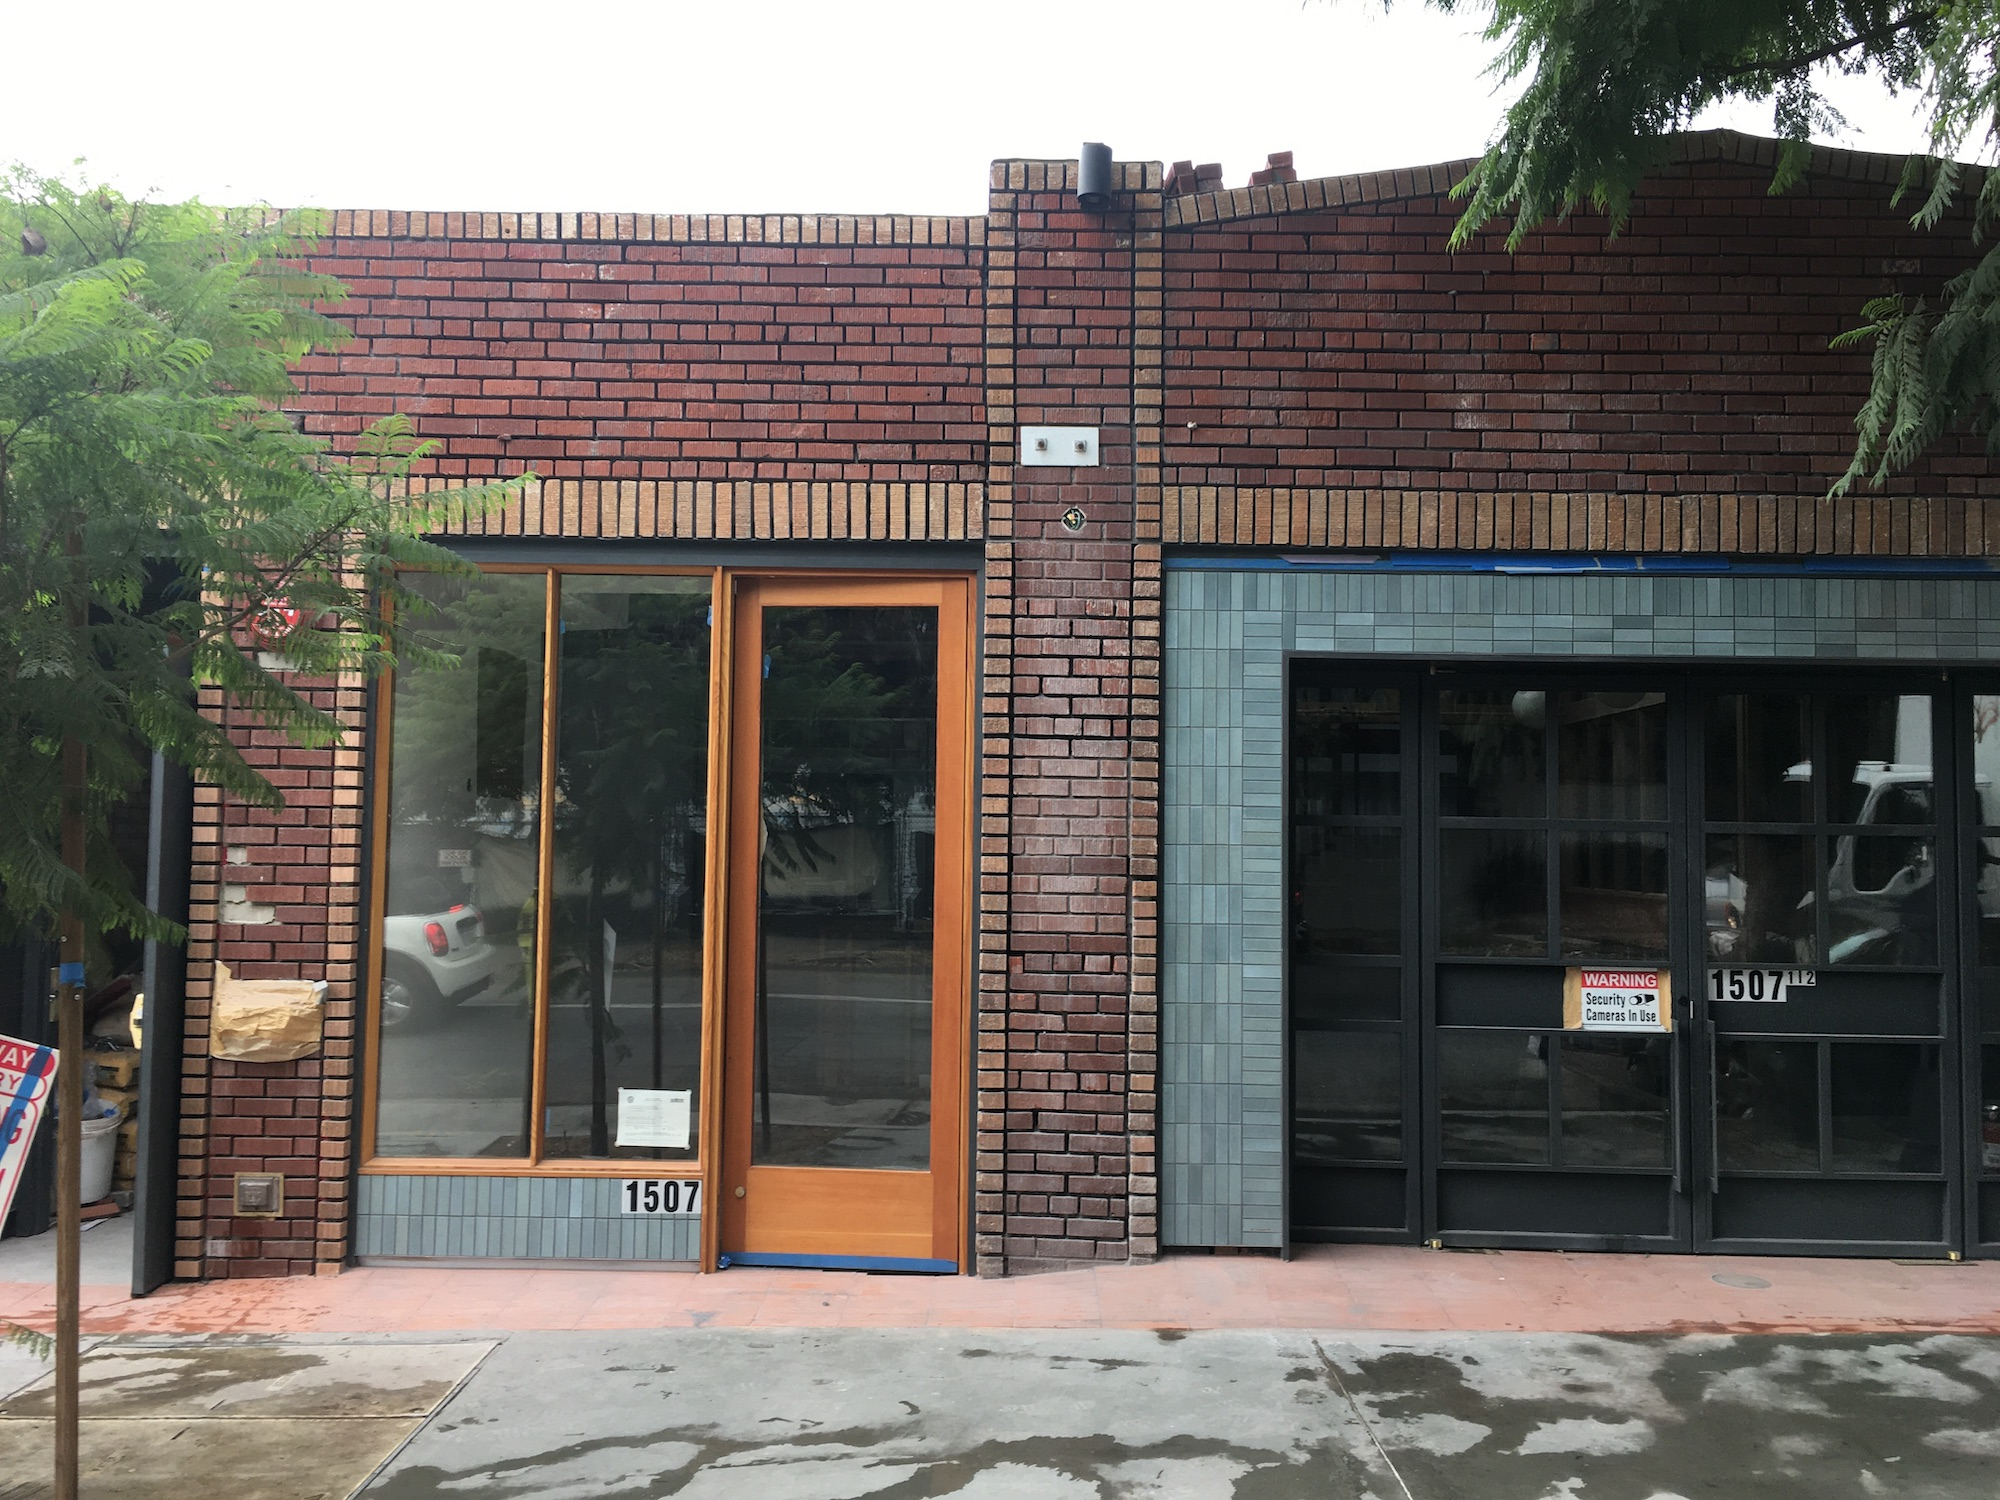 A brick exterior of an under-construction restaurant space.